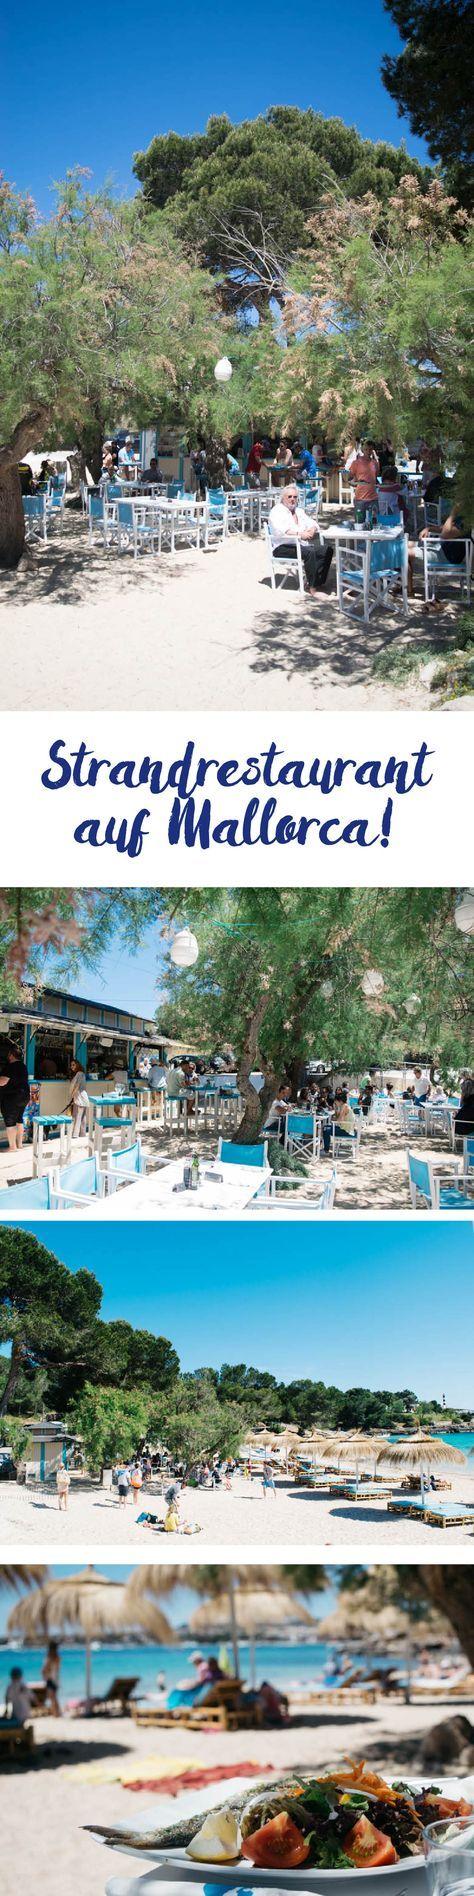 Beachrestaurant in Portocolom – Mallorca Momente #bestplacesinportugal